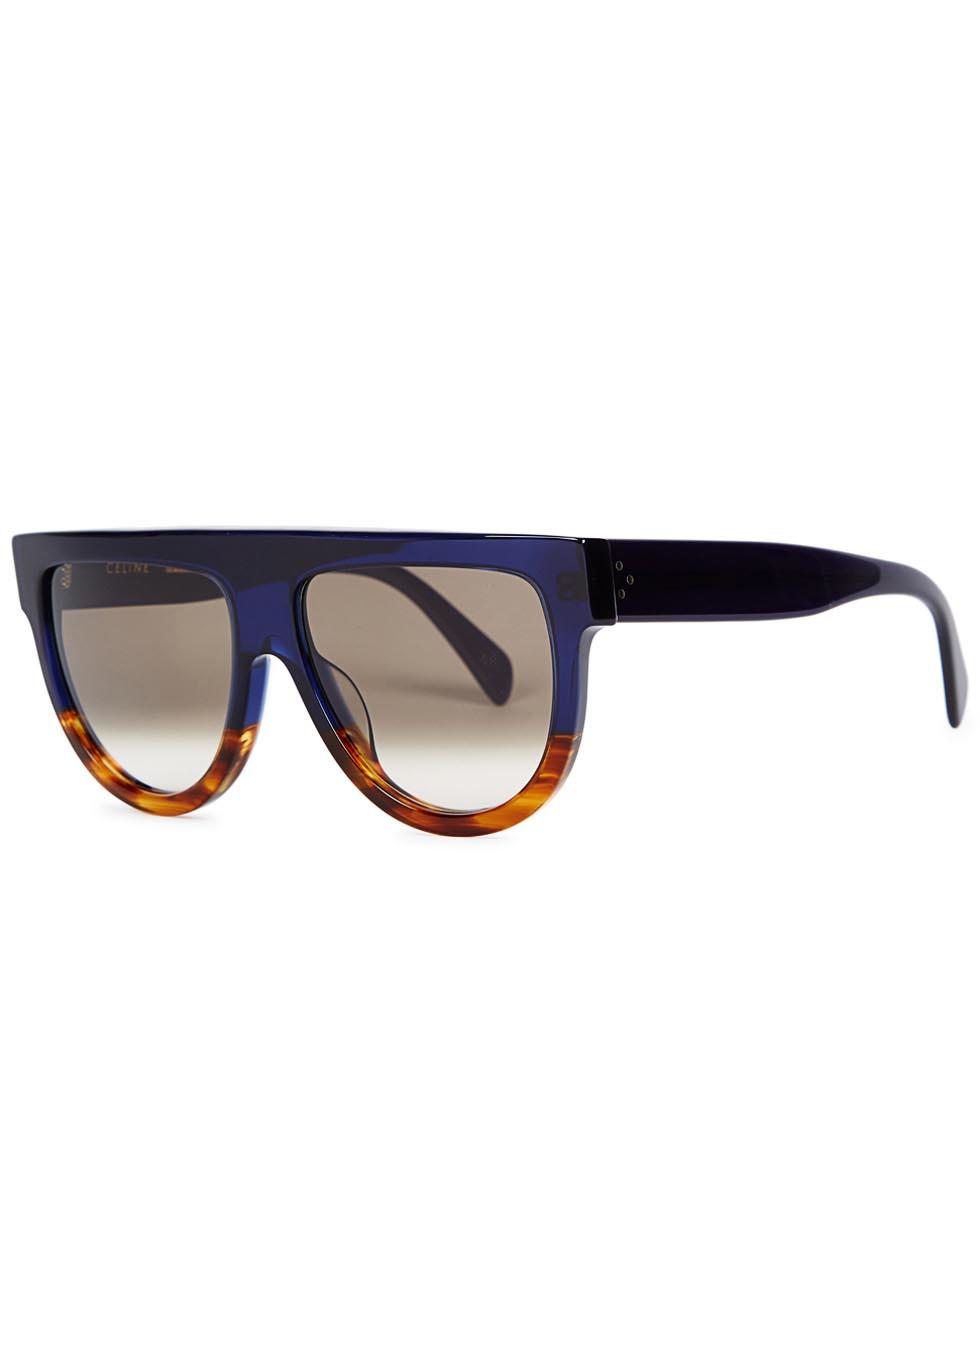 Shadow navy D-frame sunglasses - Celine